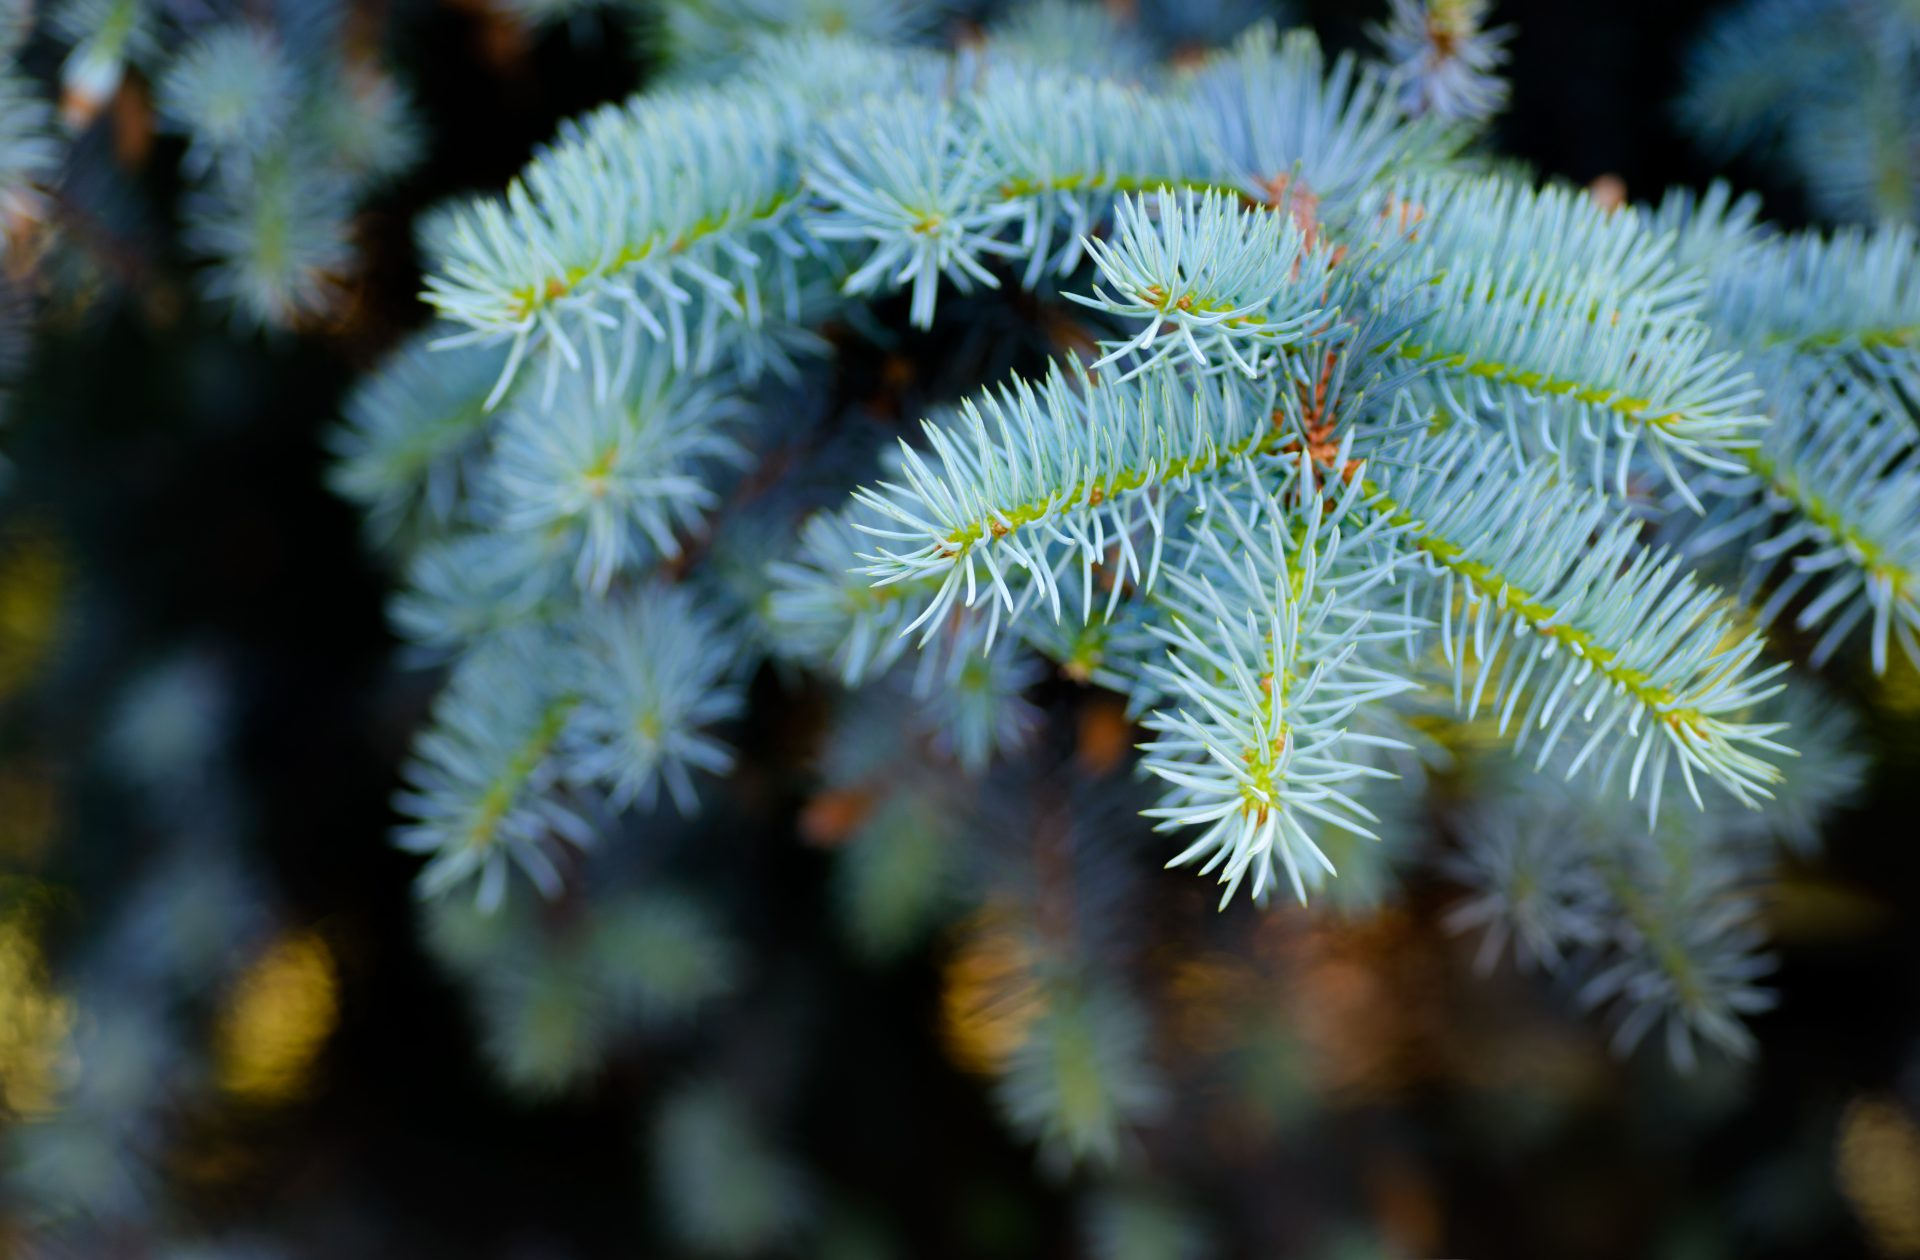 tree removal in Jarrettsville -- Keil Tree Experts